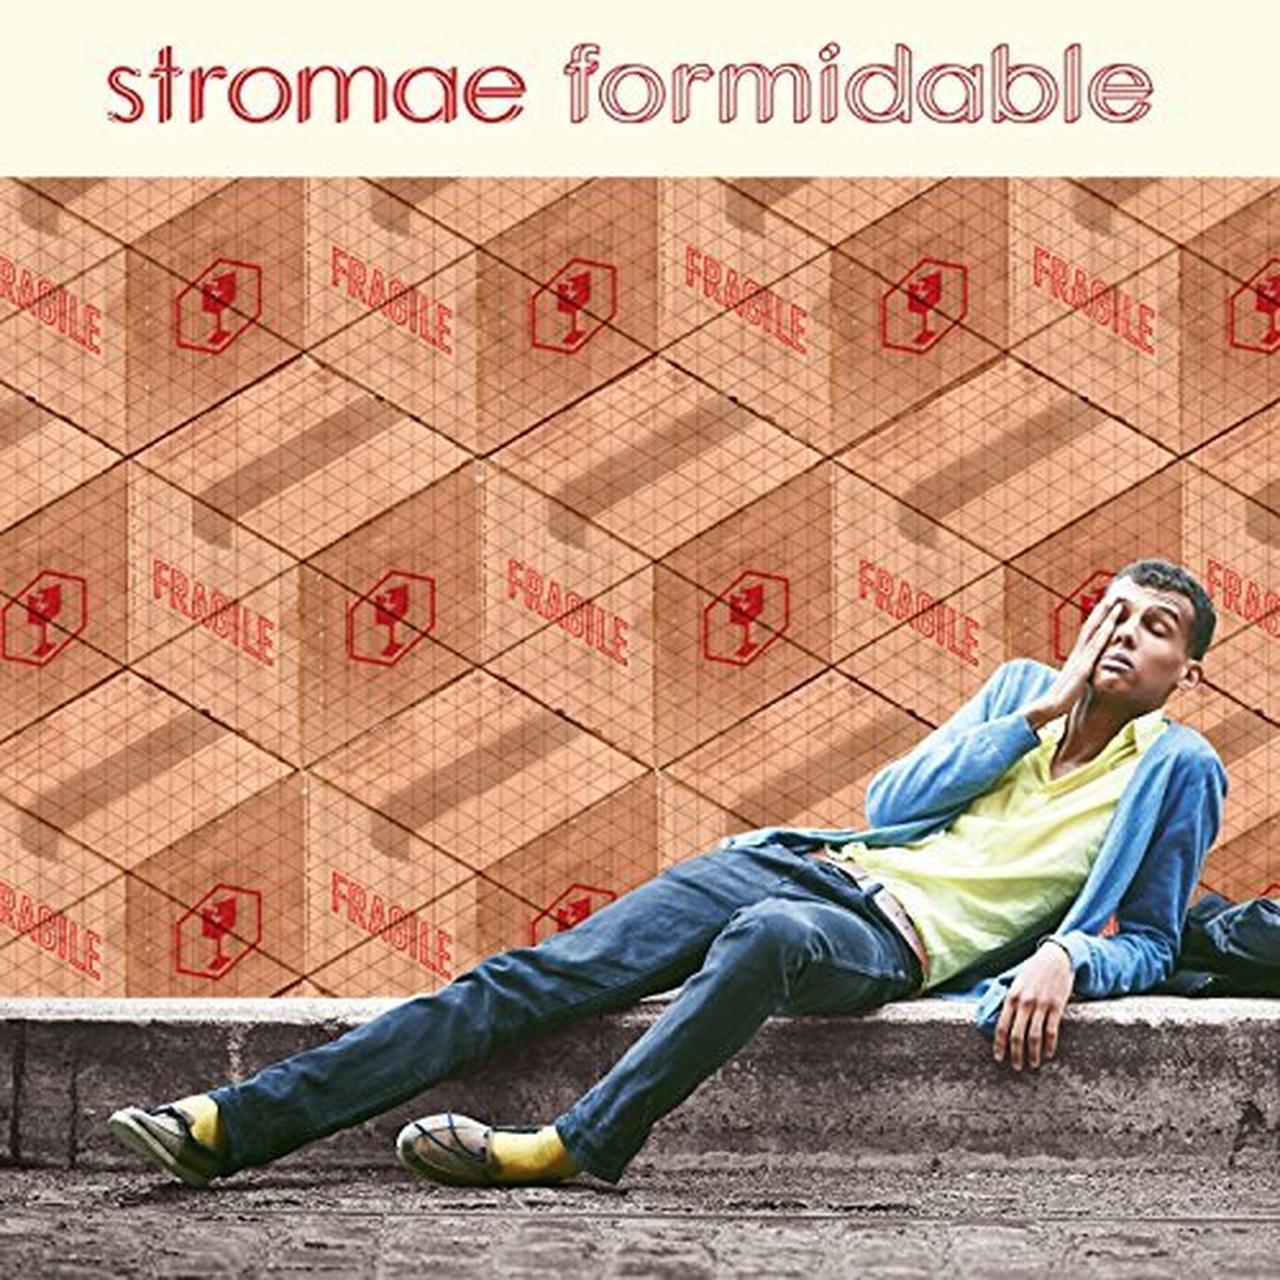 stromae formidable vinyl record